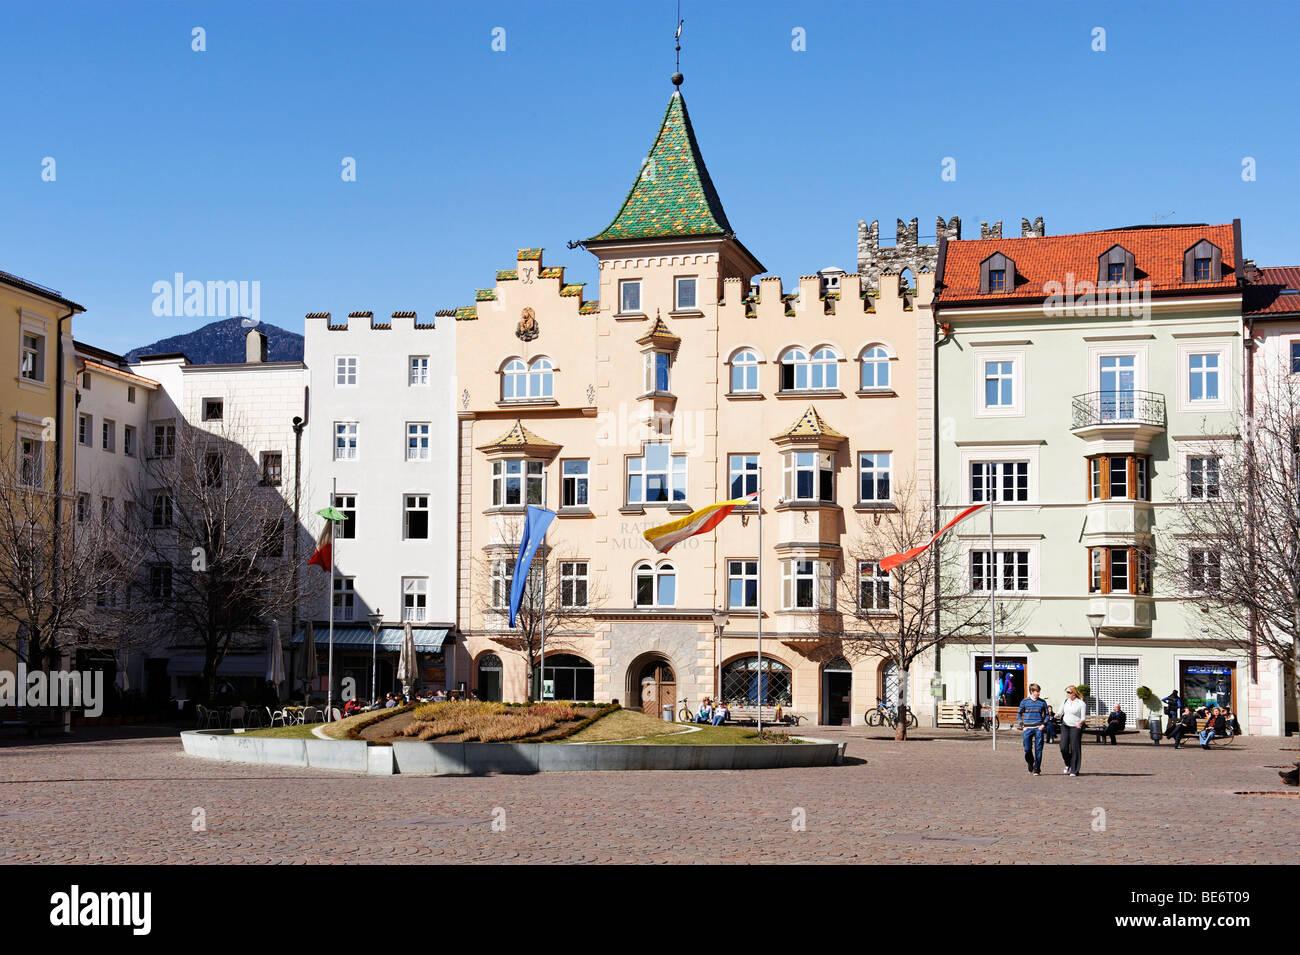 Domplatz Domplatz mit Rathaus, Brixen, Brixen, Südtirol, Italien, Europa Stockbild